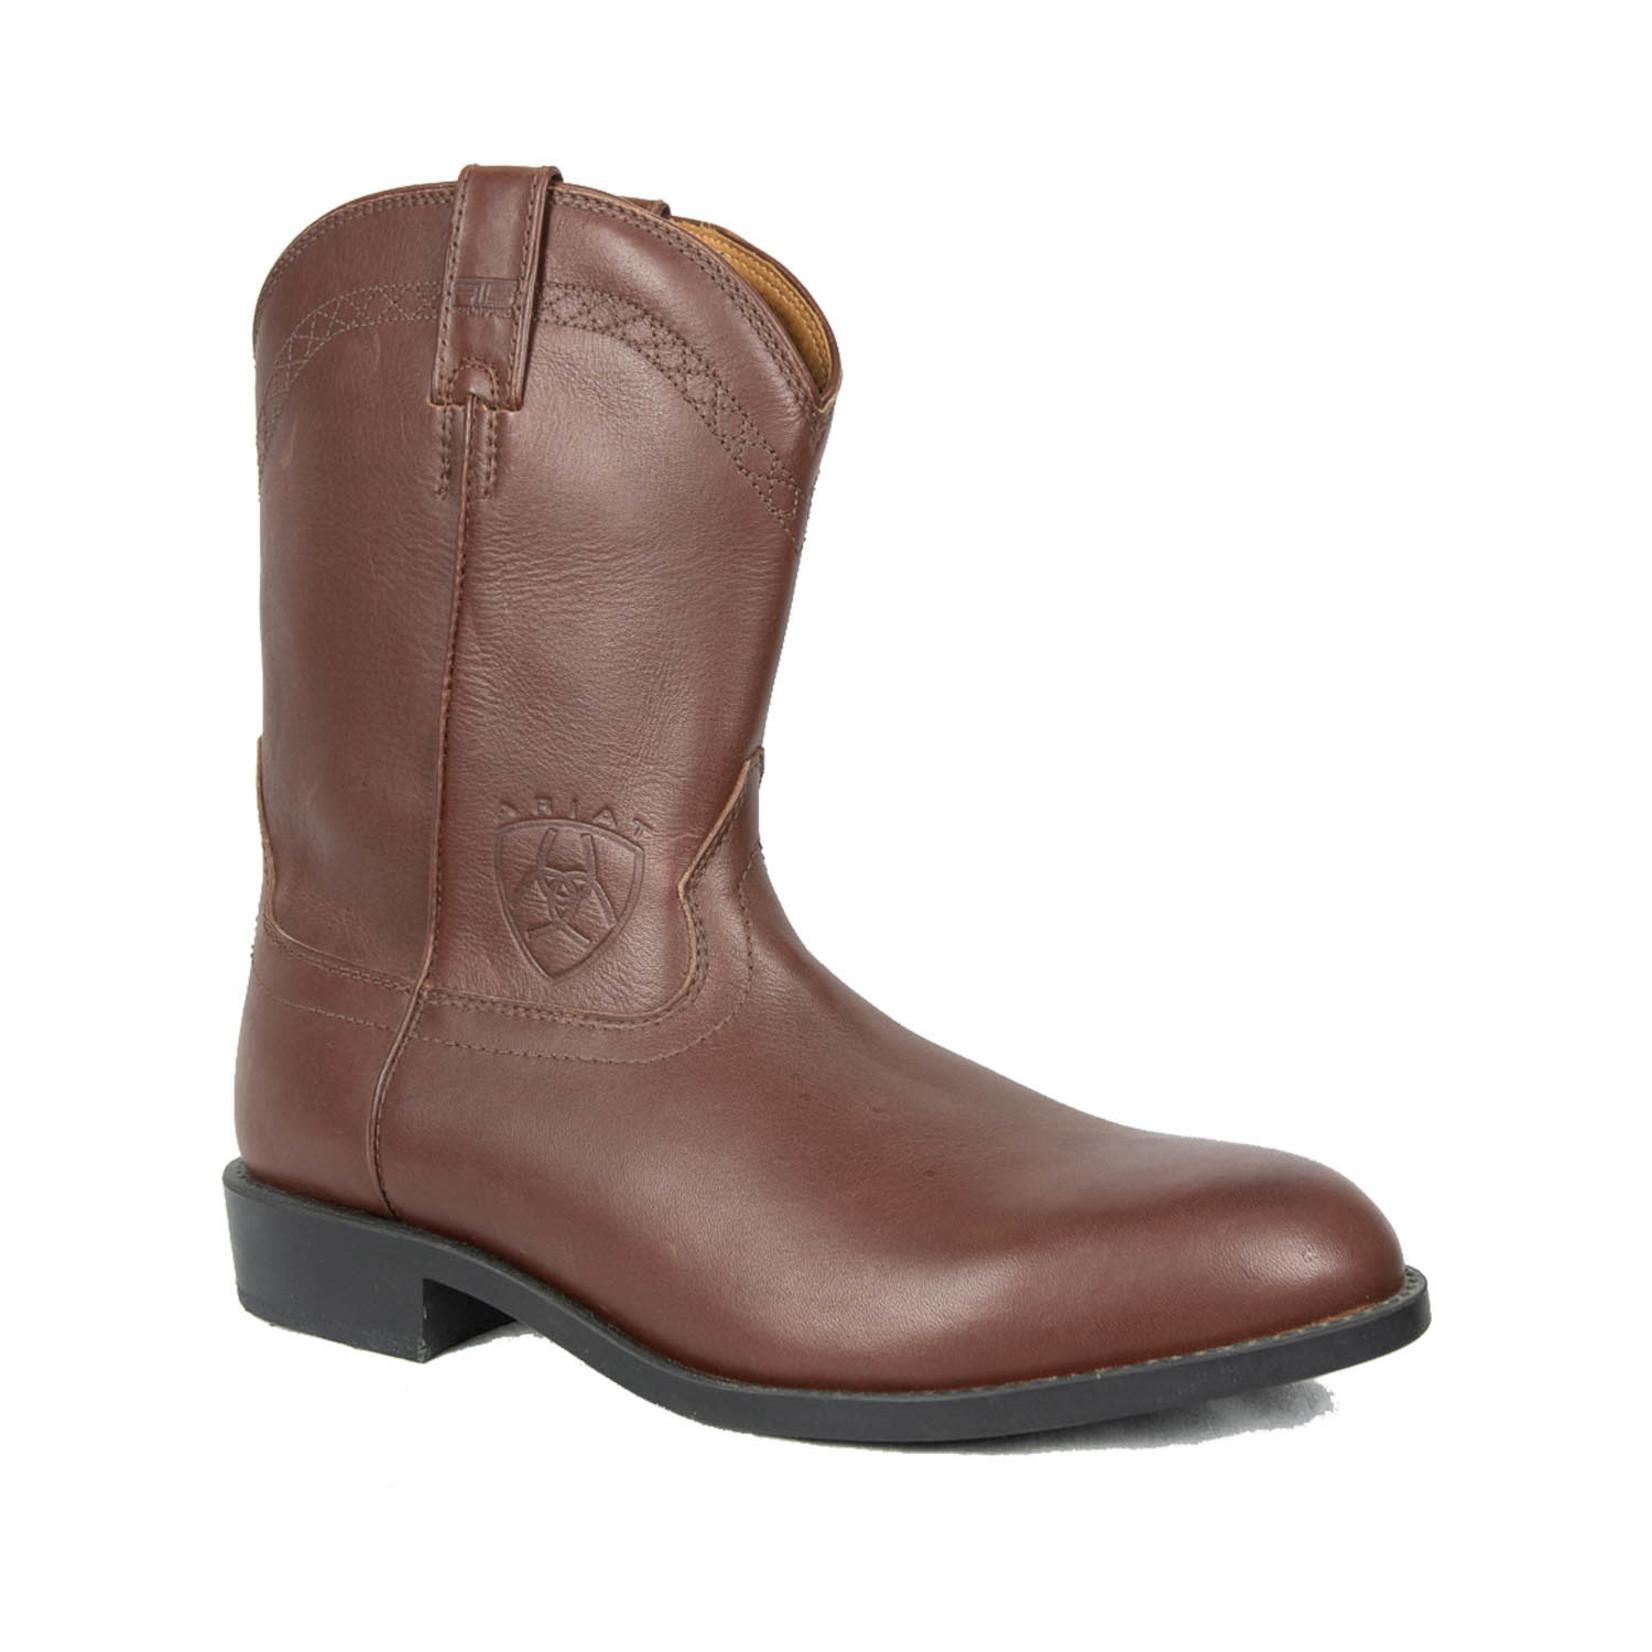 Ariat Ariat Classic Men's Cowboy Boot 34161